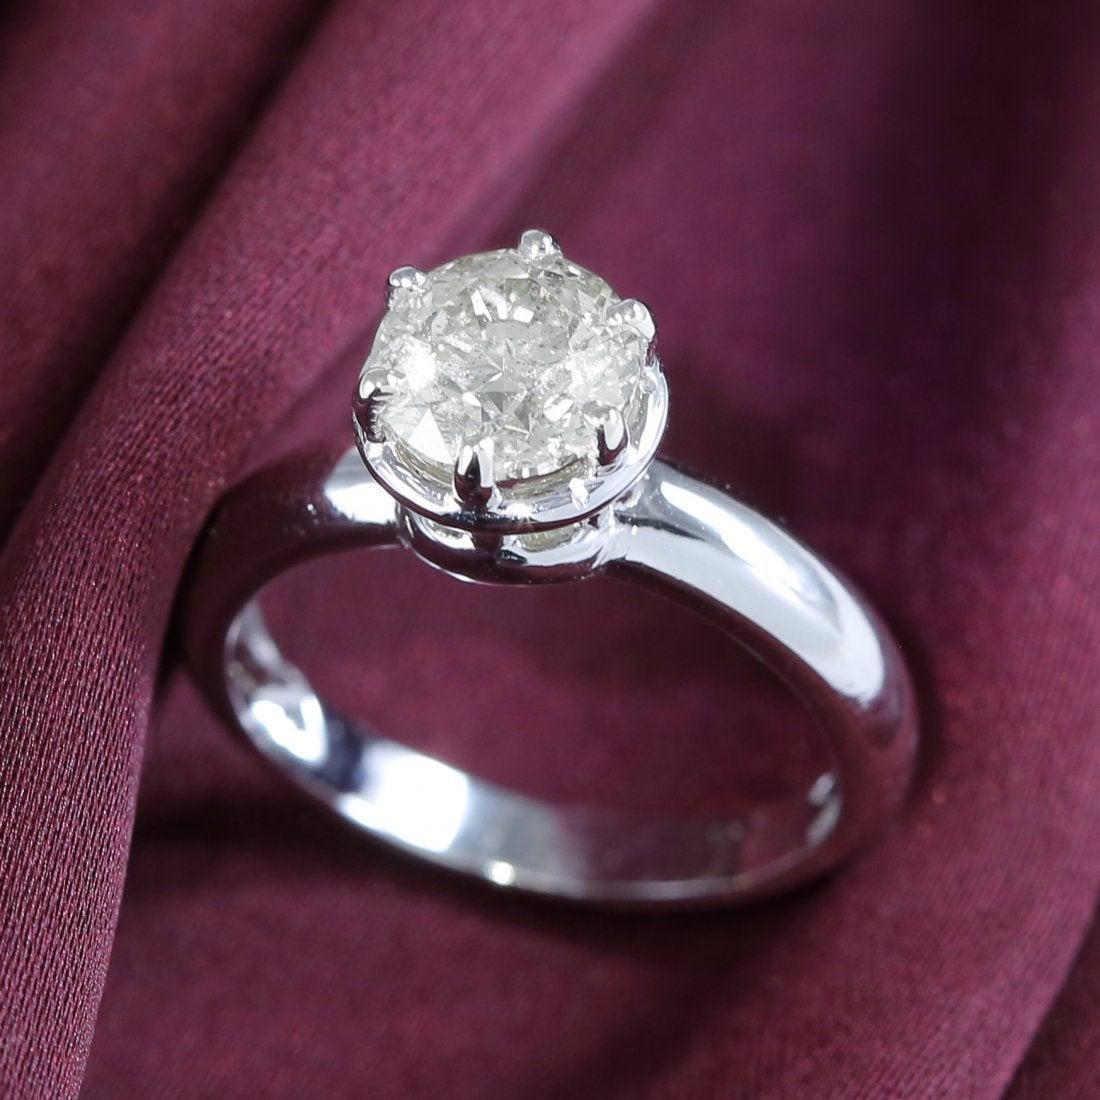 14 K White Gold IGI Certified Solitaire Diamond Ring